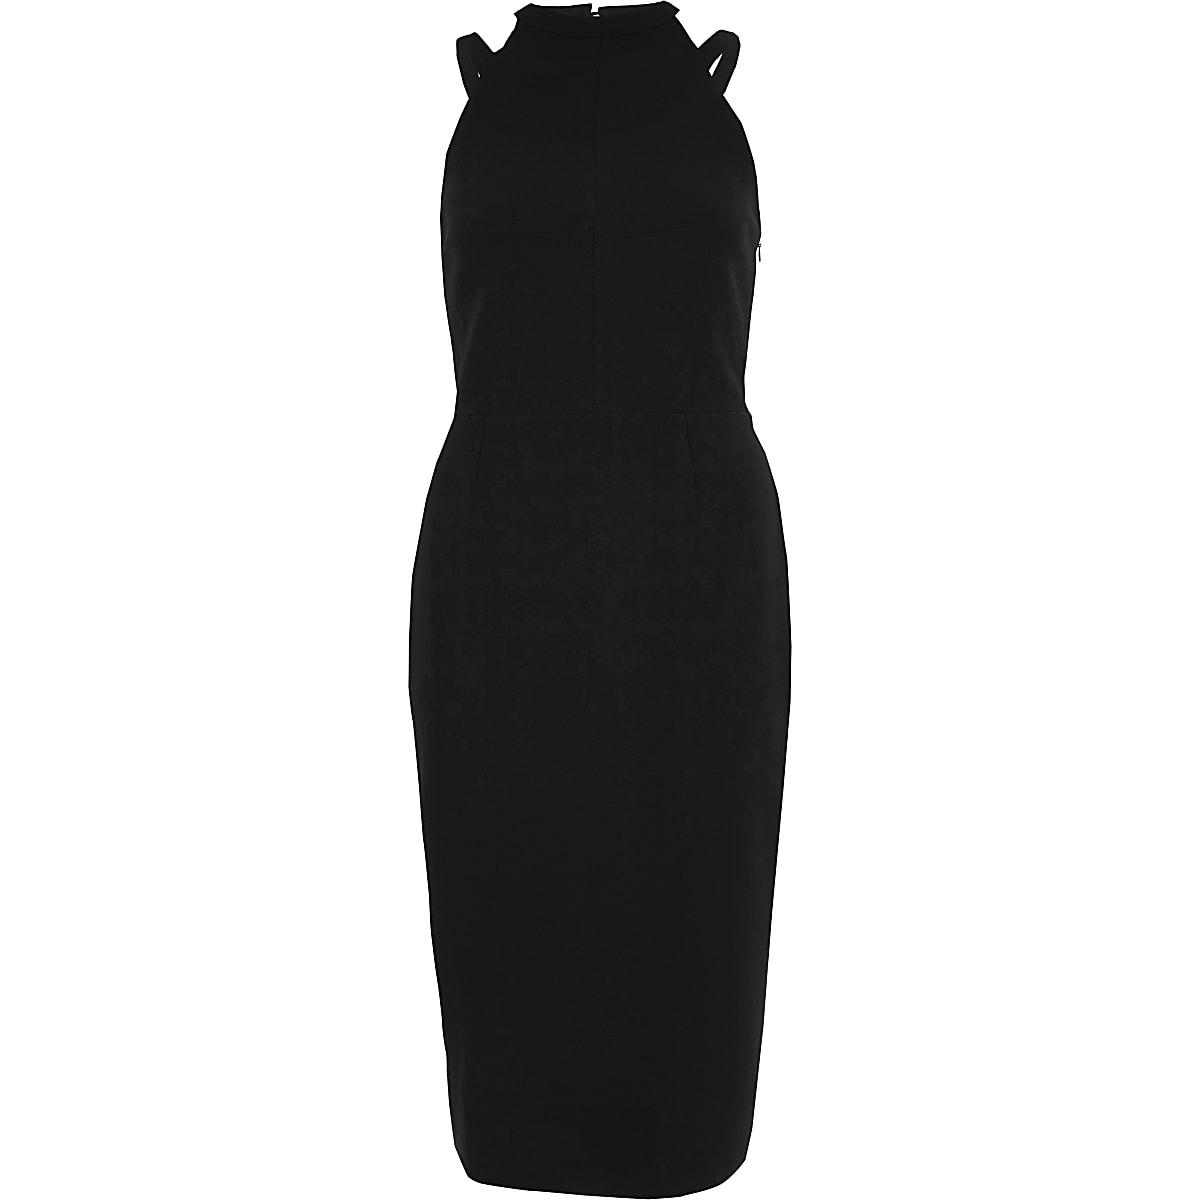 Black sleeveless high neck bodycon dress